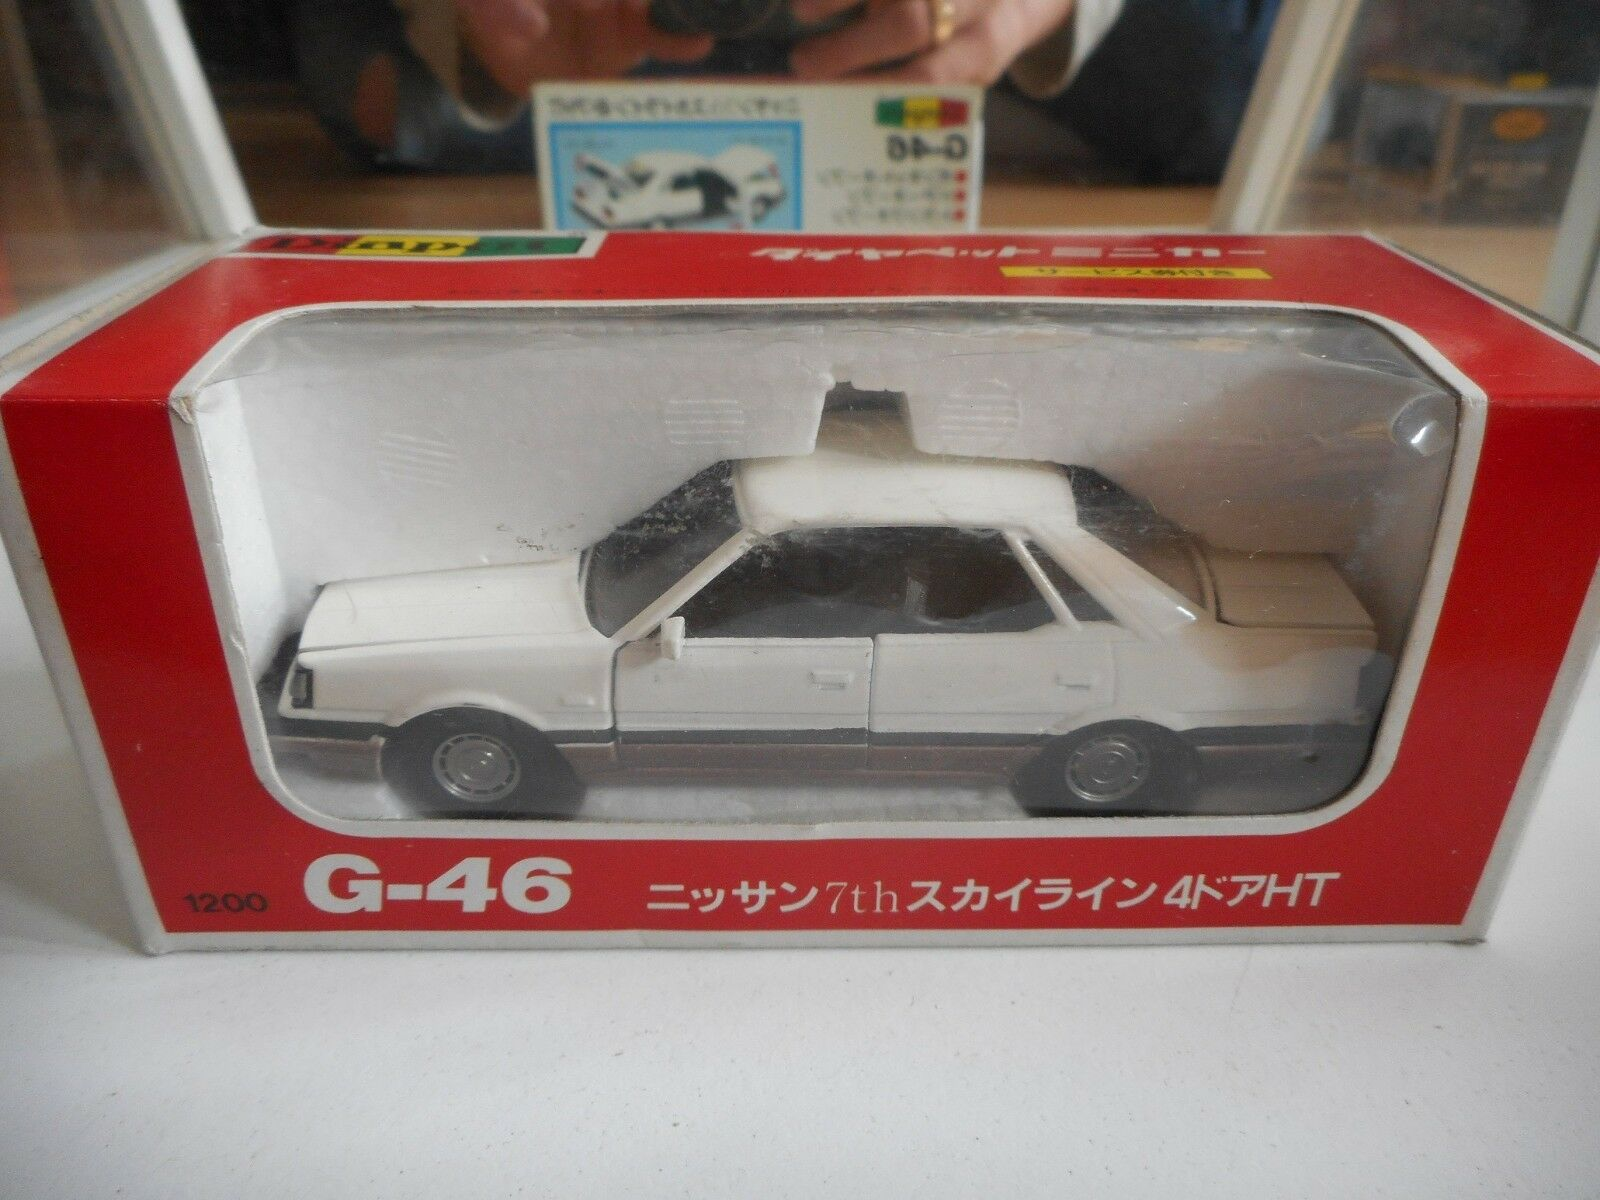 Yonezawa Diapet Nissan 7th Sky,ine 4-Door Hardtop in bianca on 1 40 in Box